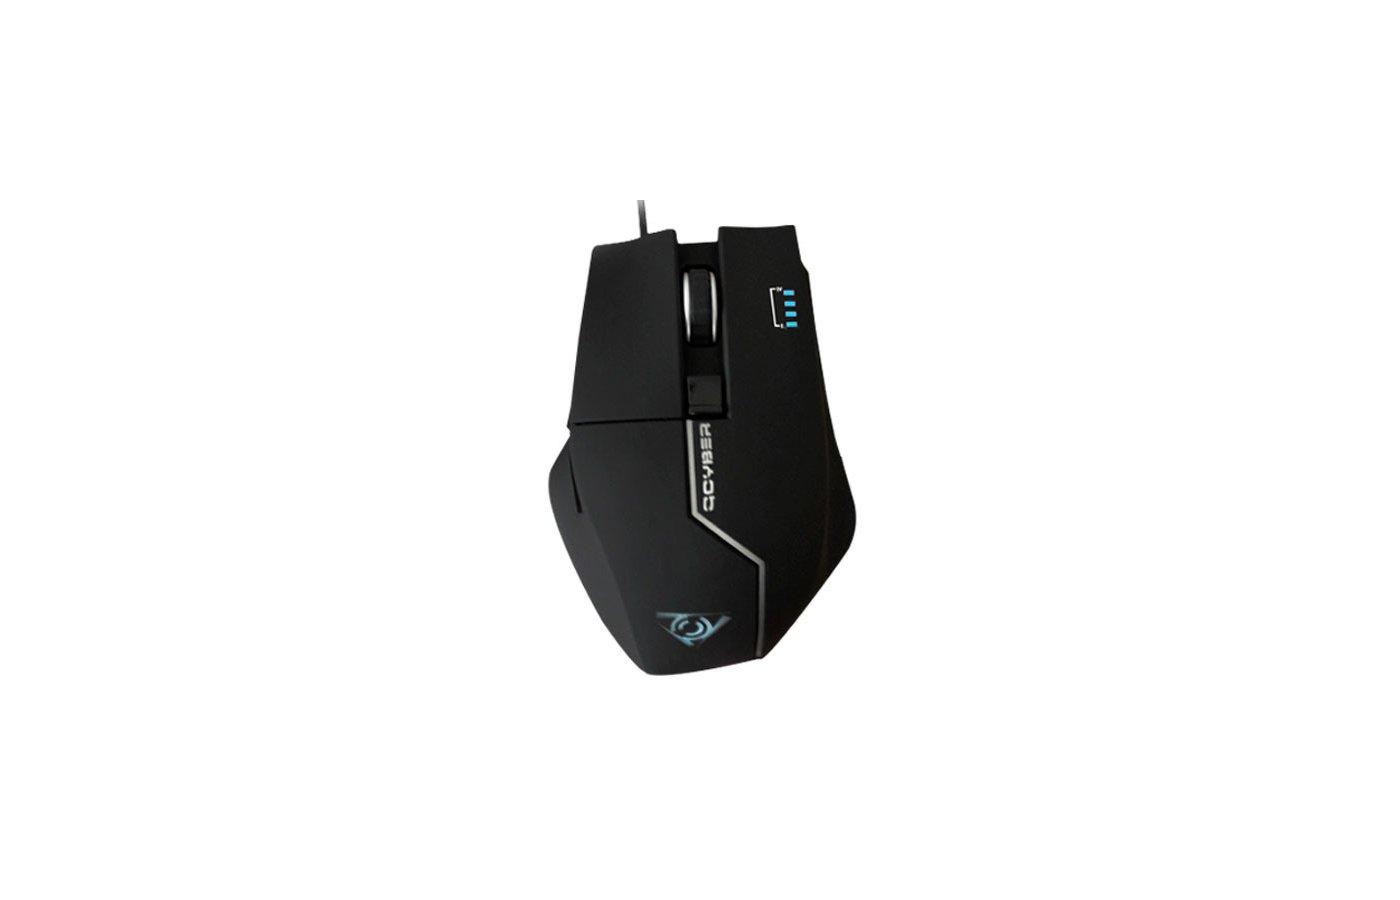 Мышь проводная Qcyber Zorg Black QC-02-004DV02